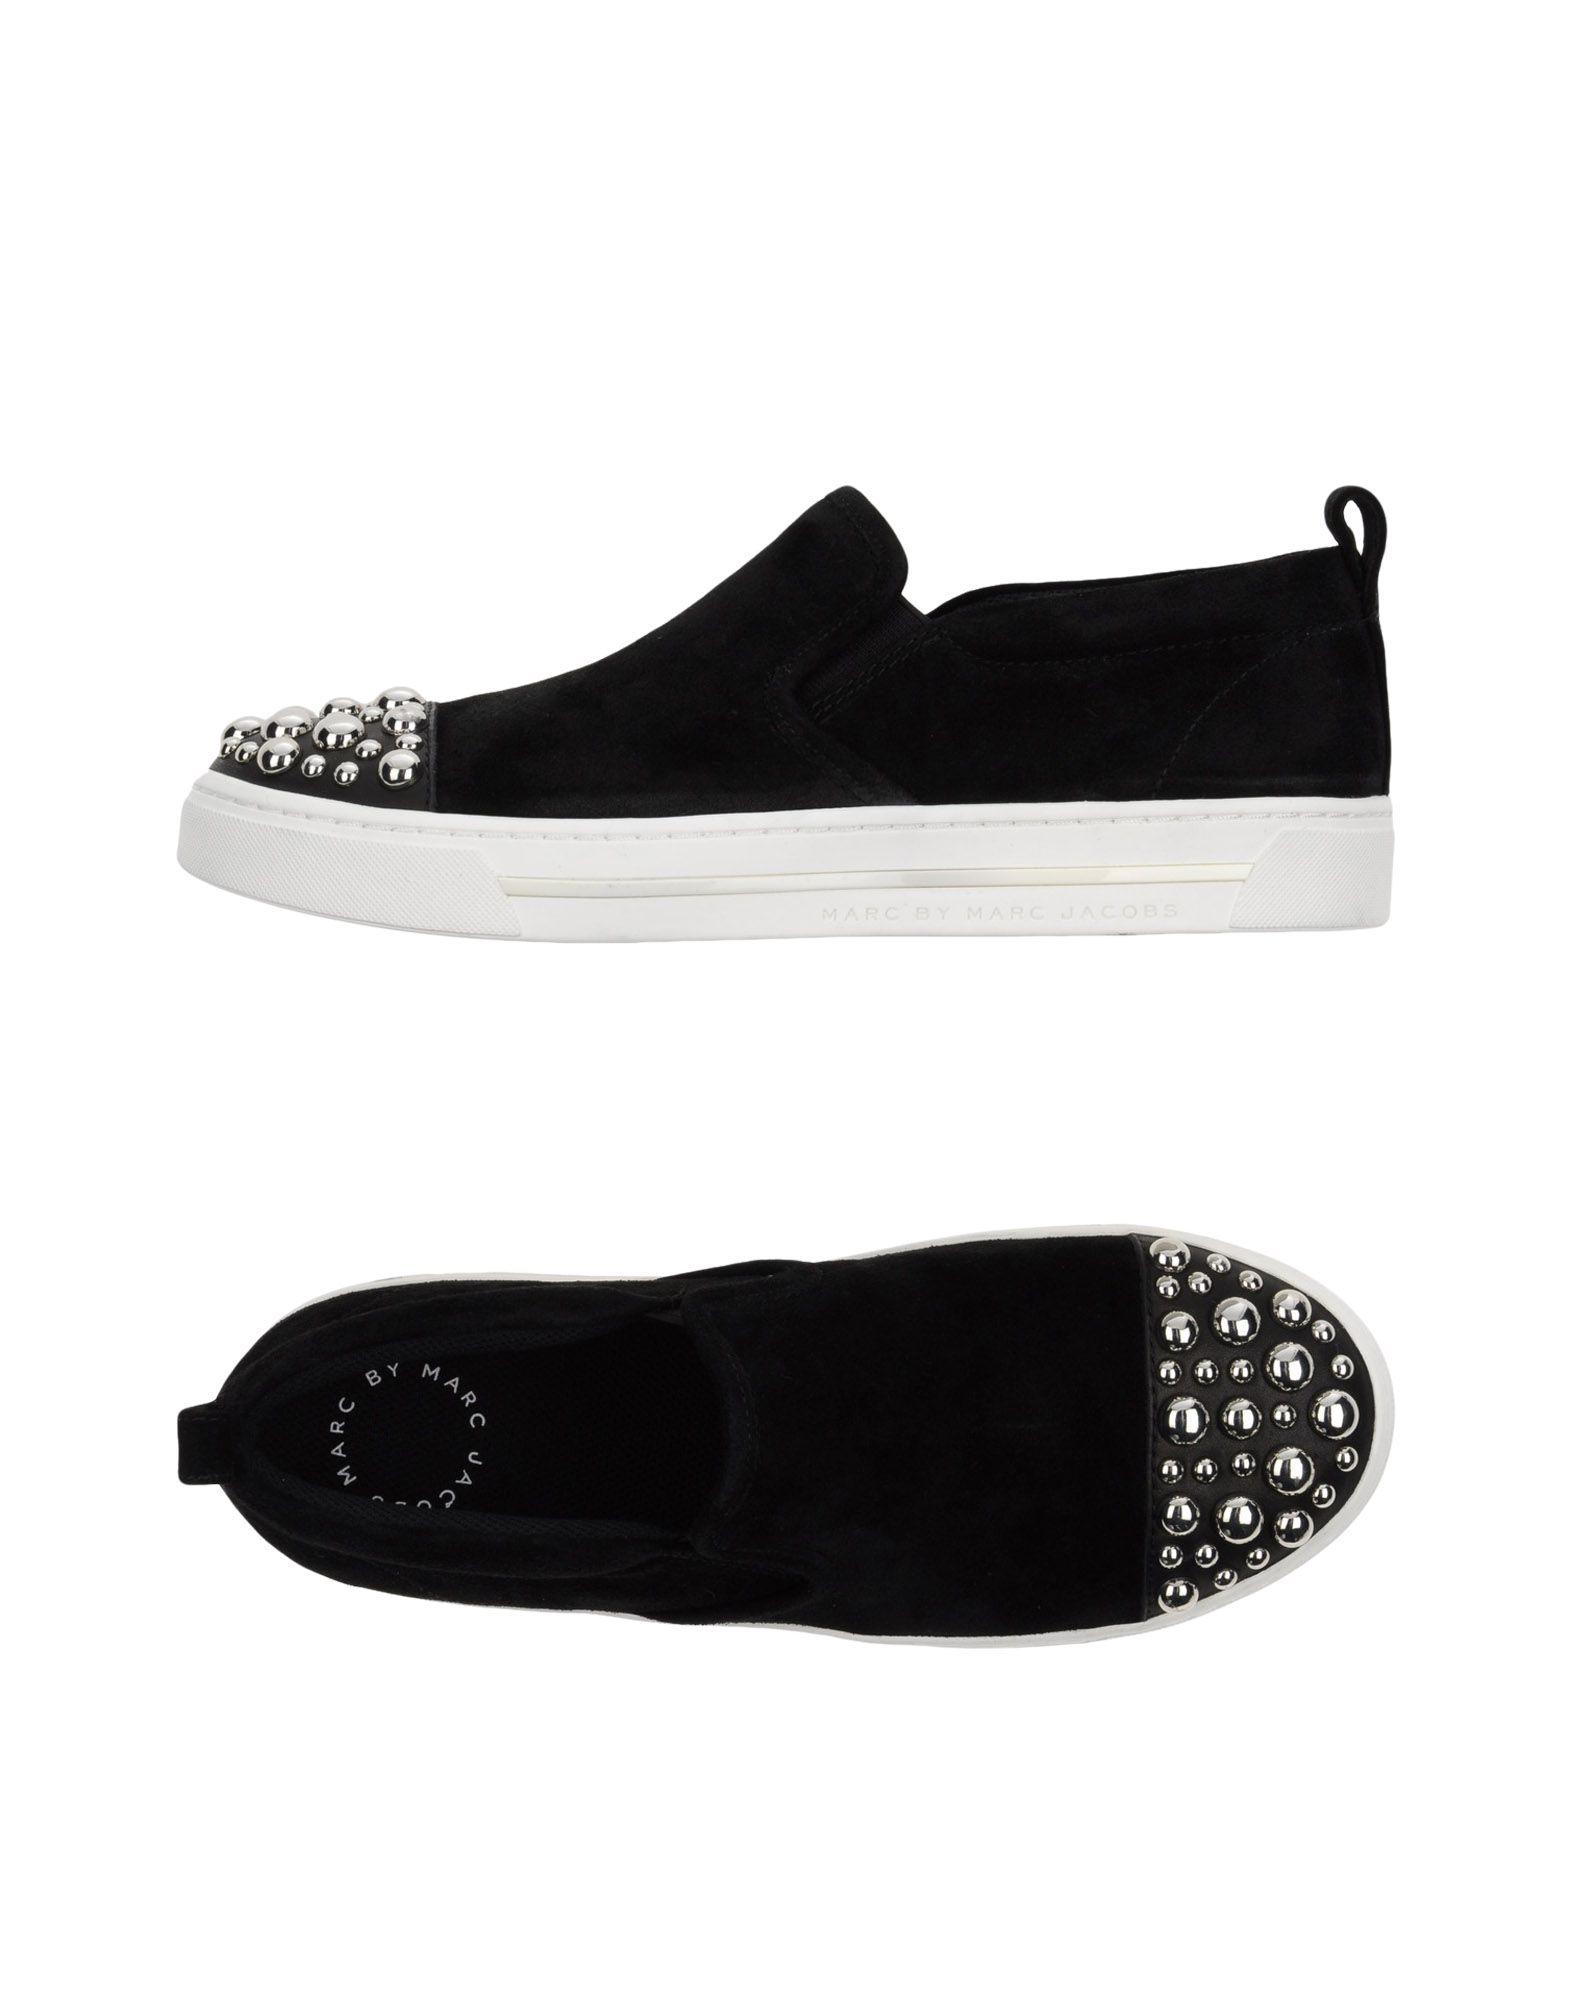 Stilvolle billige Schuhe Marc By Marc Jacobs Damen Turnschuhes Damen Jacobs 11350735JK 34772c